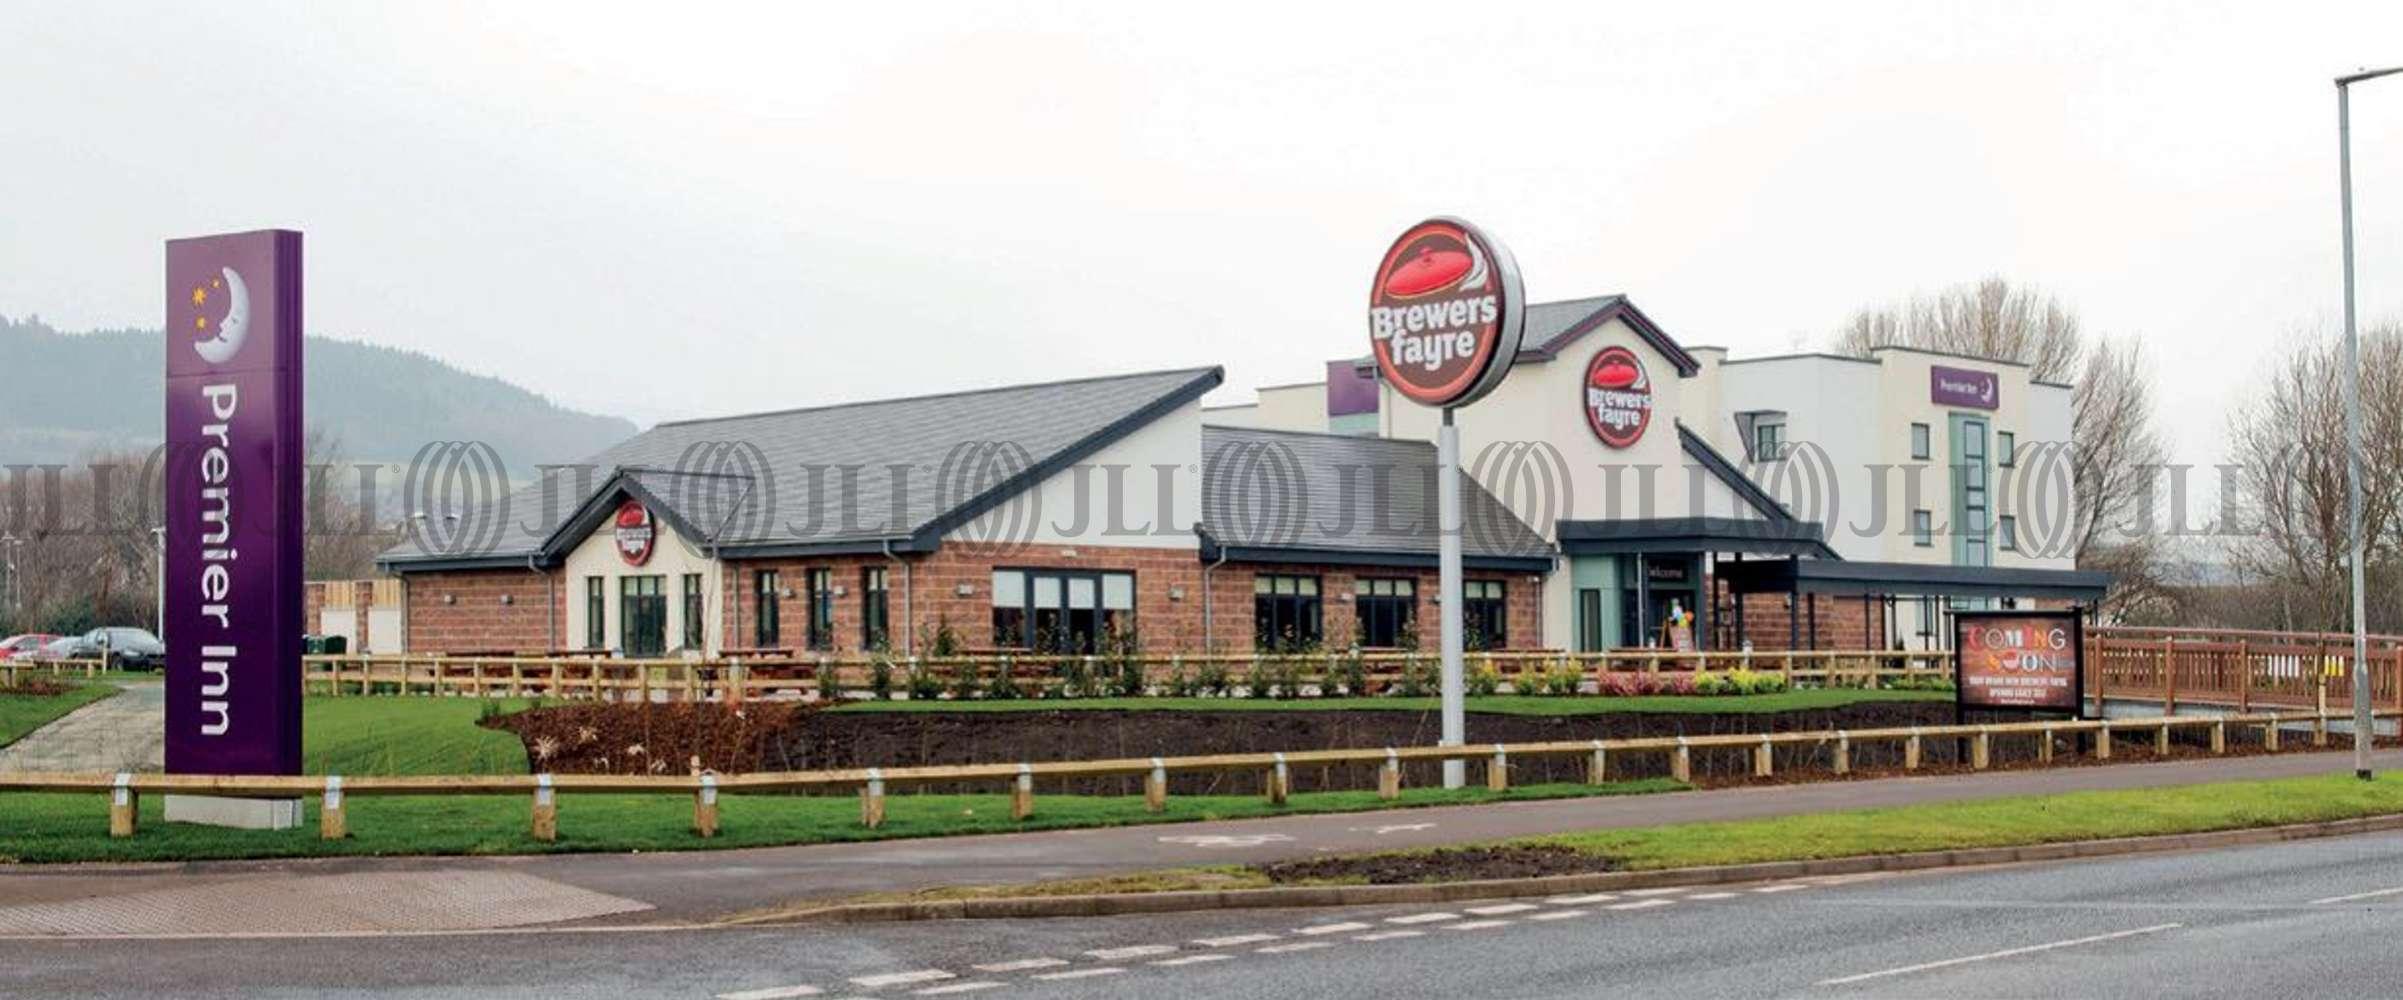 Land Exeter, EX1 1UG - Premier Inn Prospects for the South West - 3